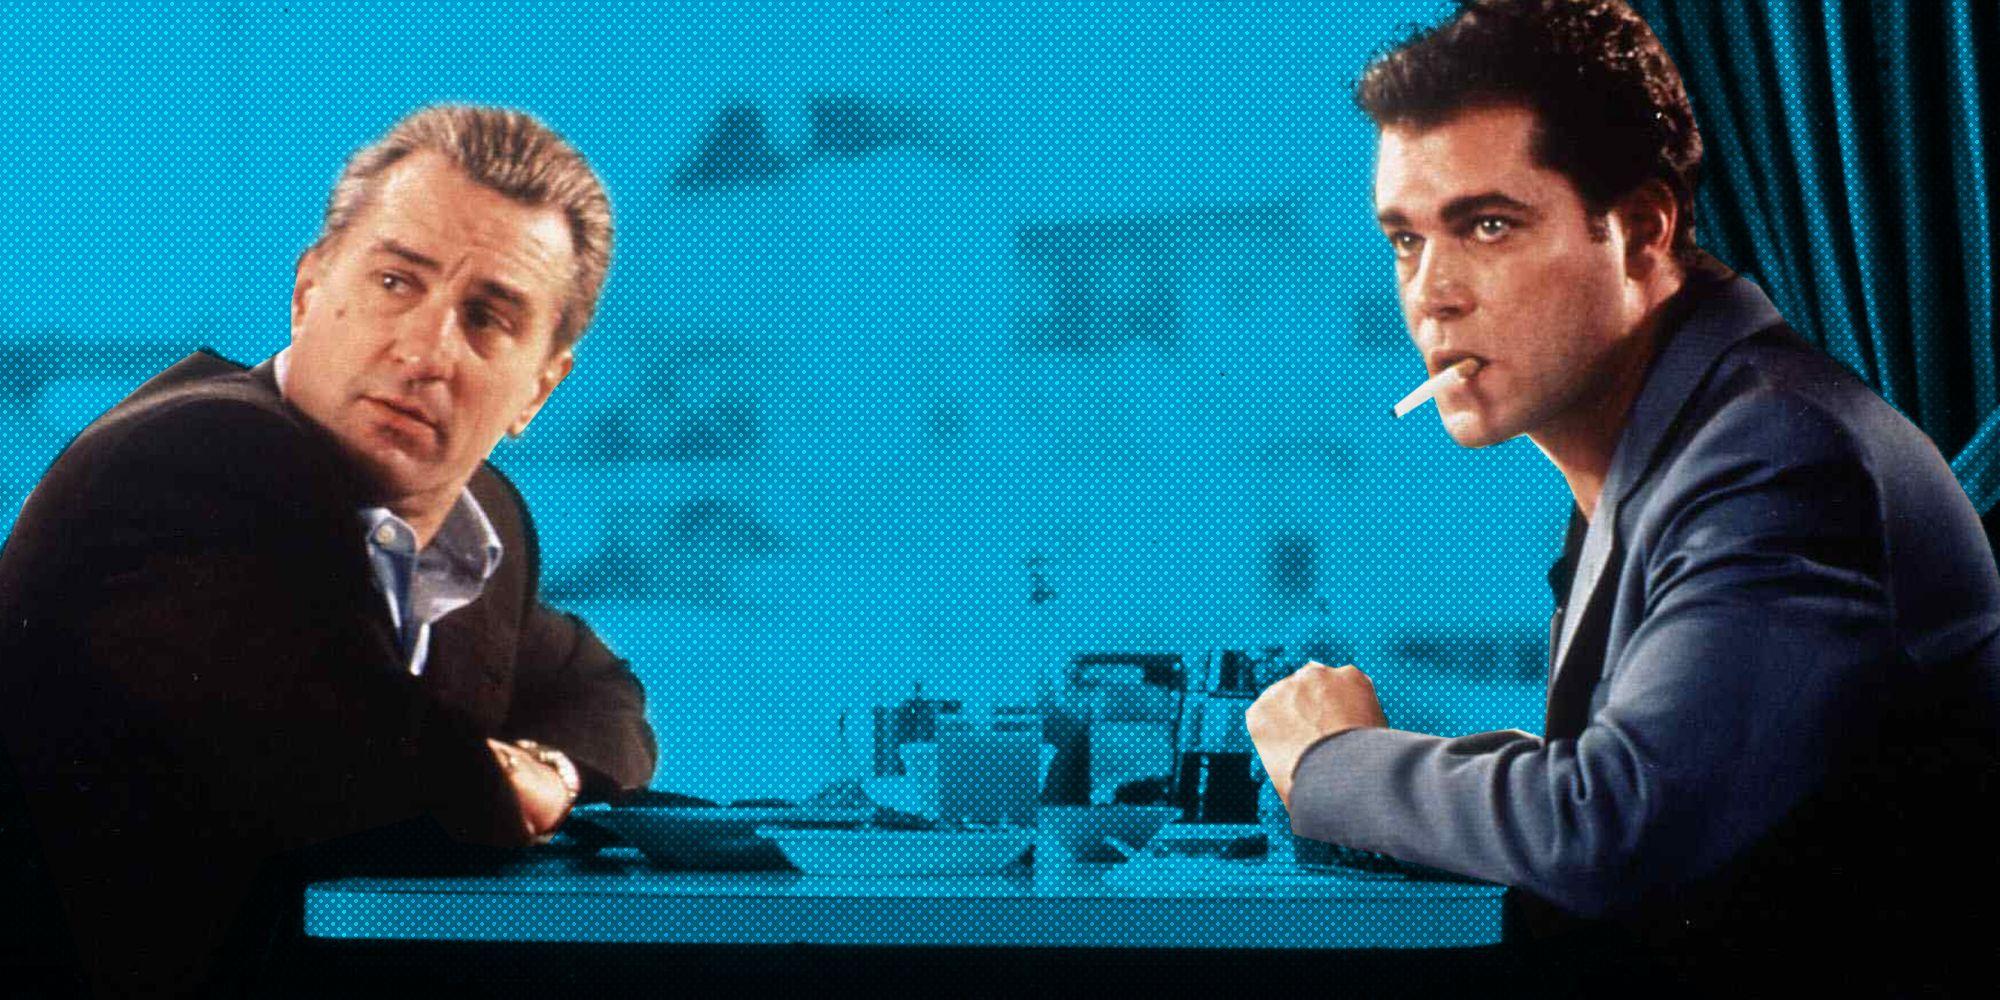 goodfellas film analysis